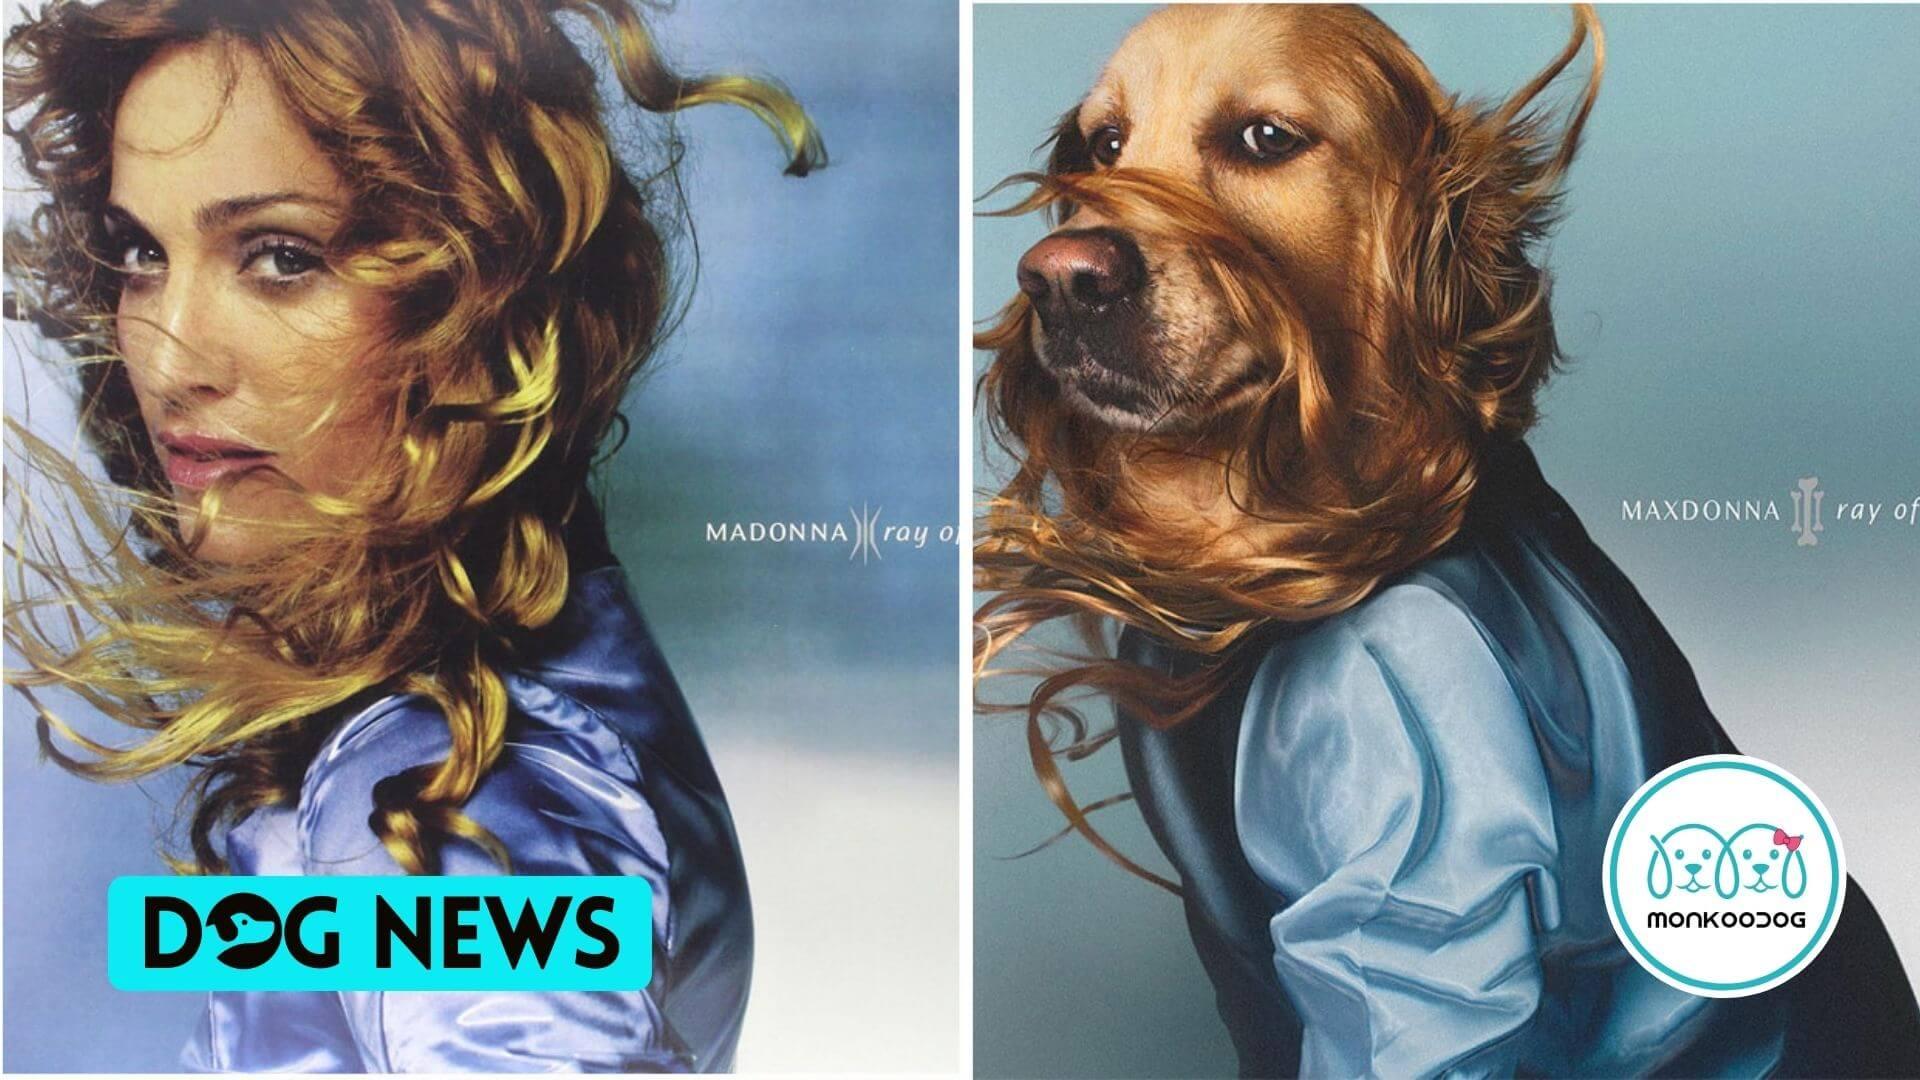 Dog recreates madonna's photos